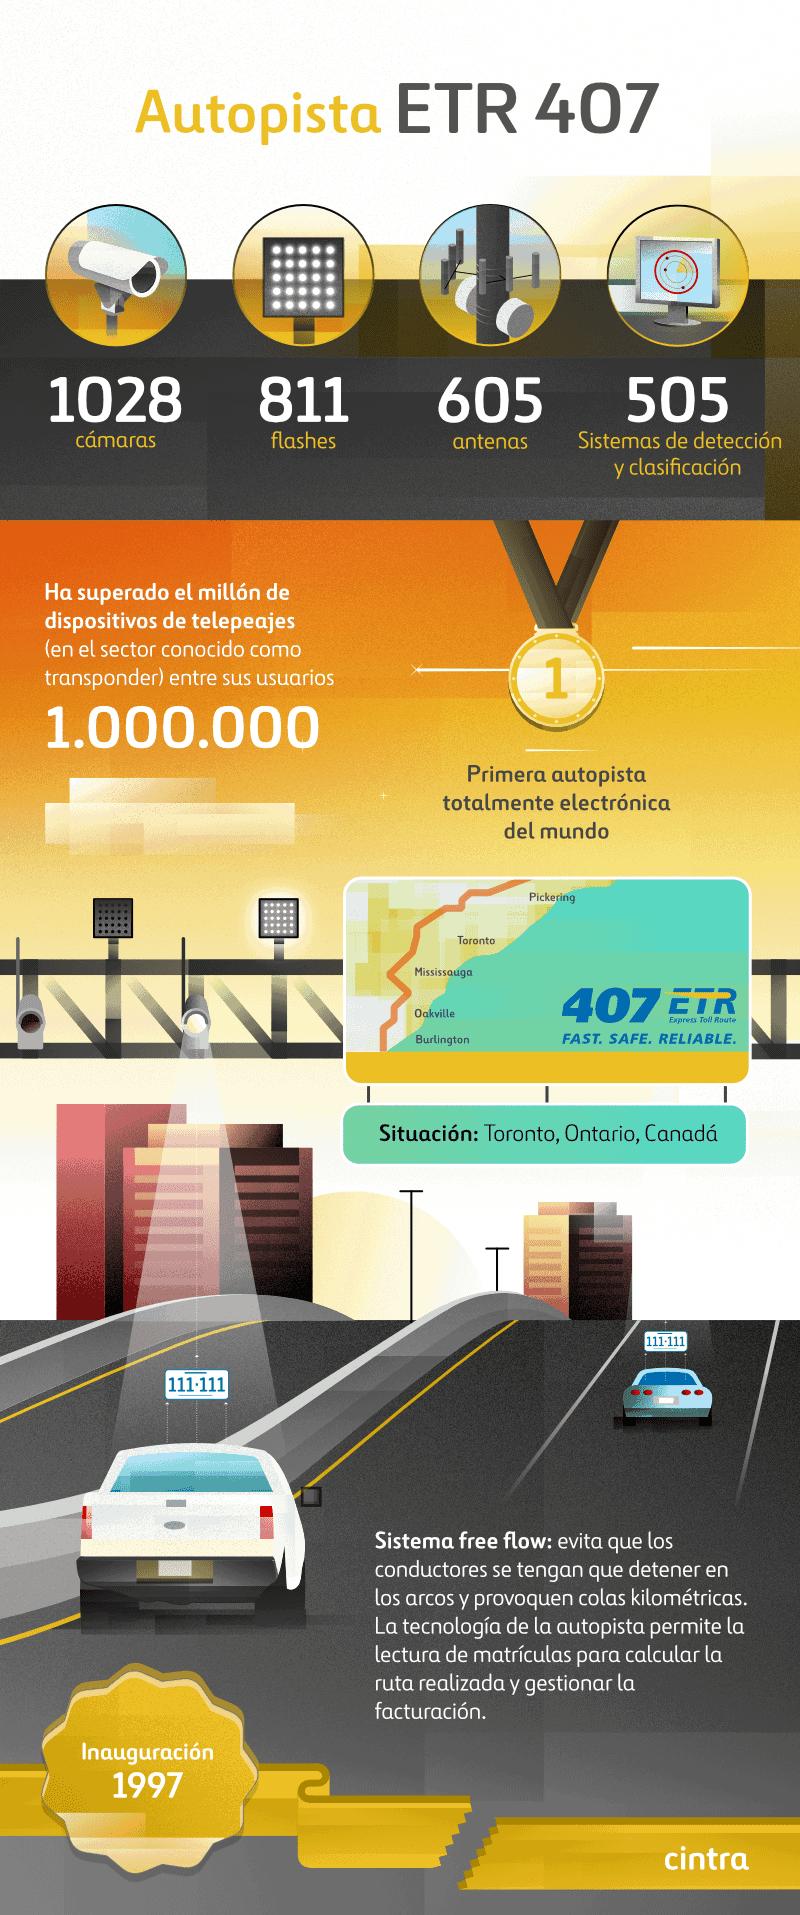 Infografía 407 ETR autopista en Canada